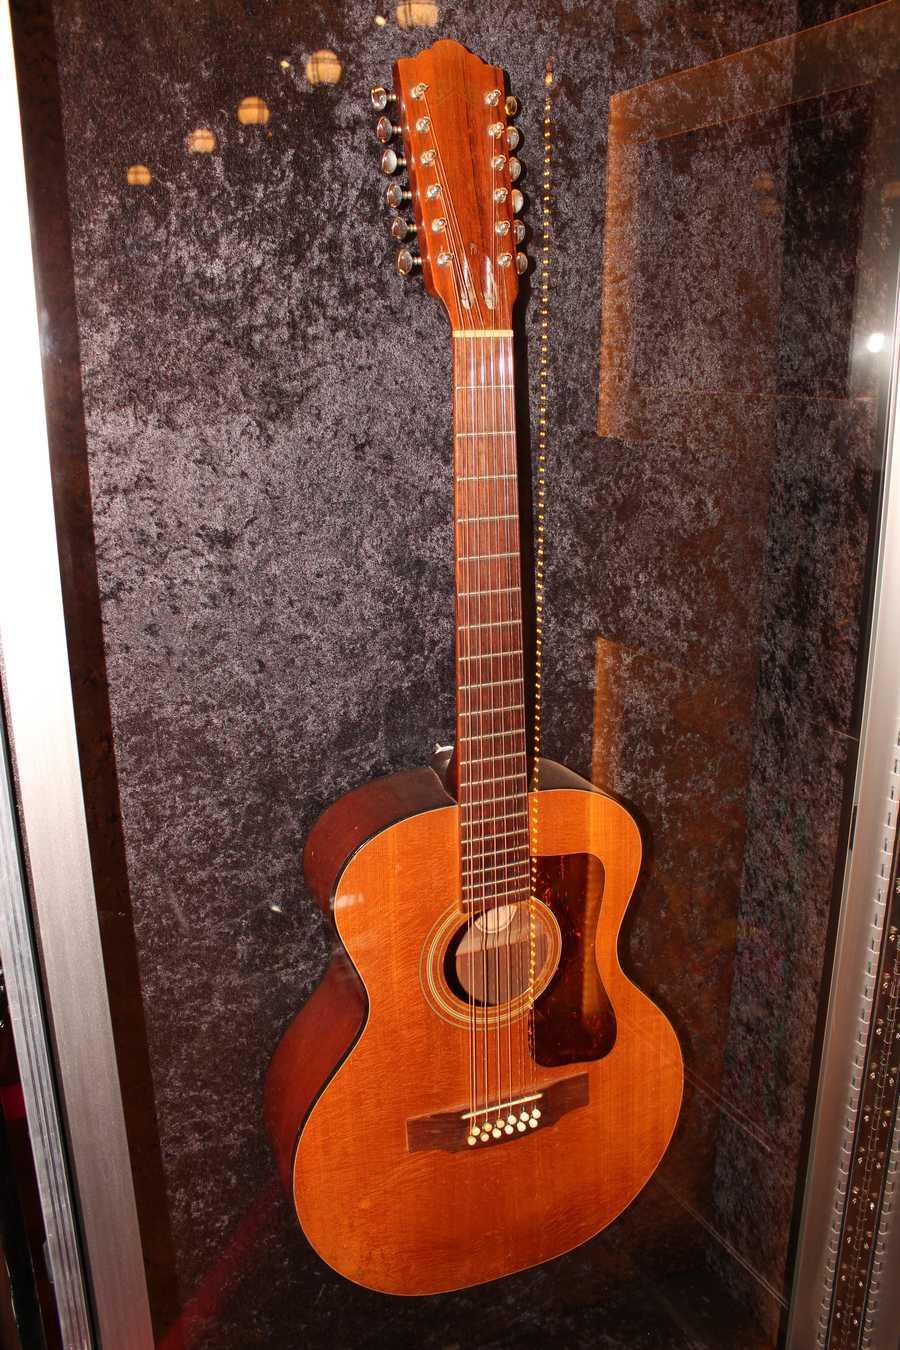 Bob Marley's Guild 12-string acoustic